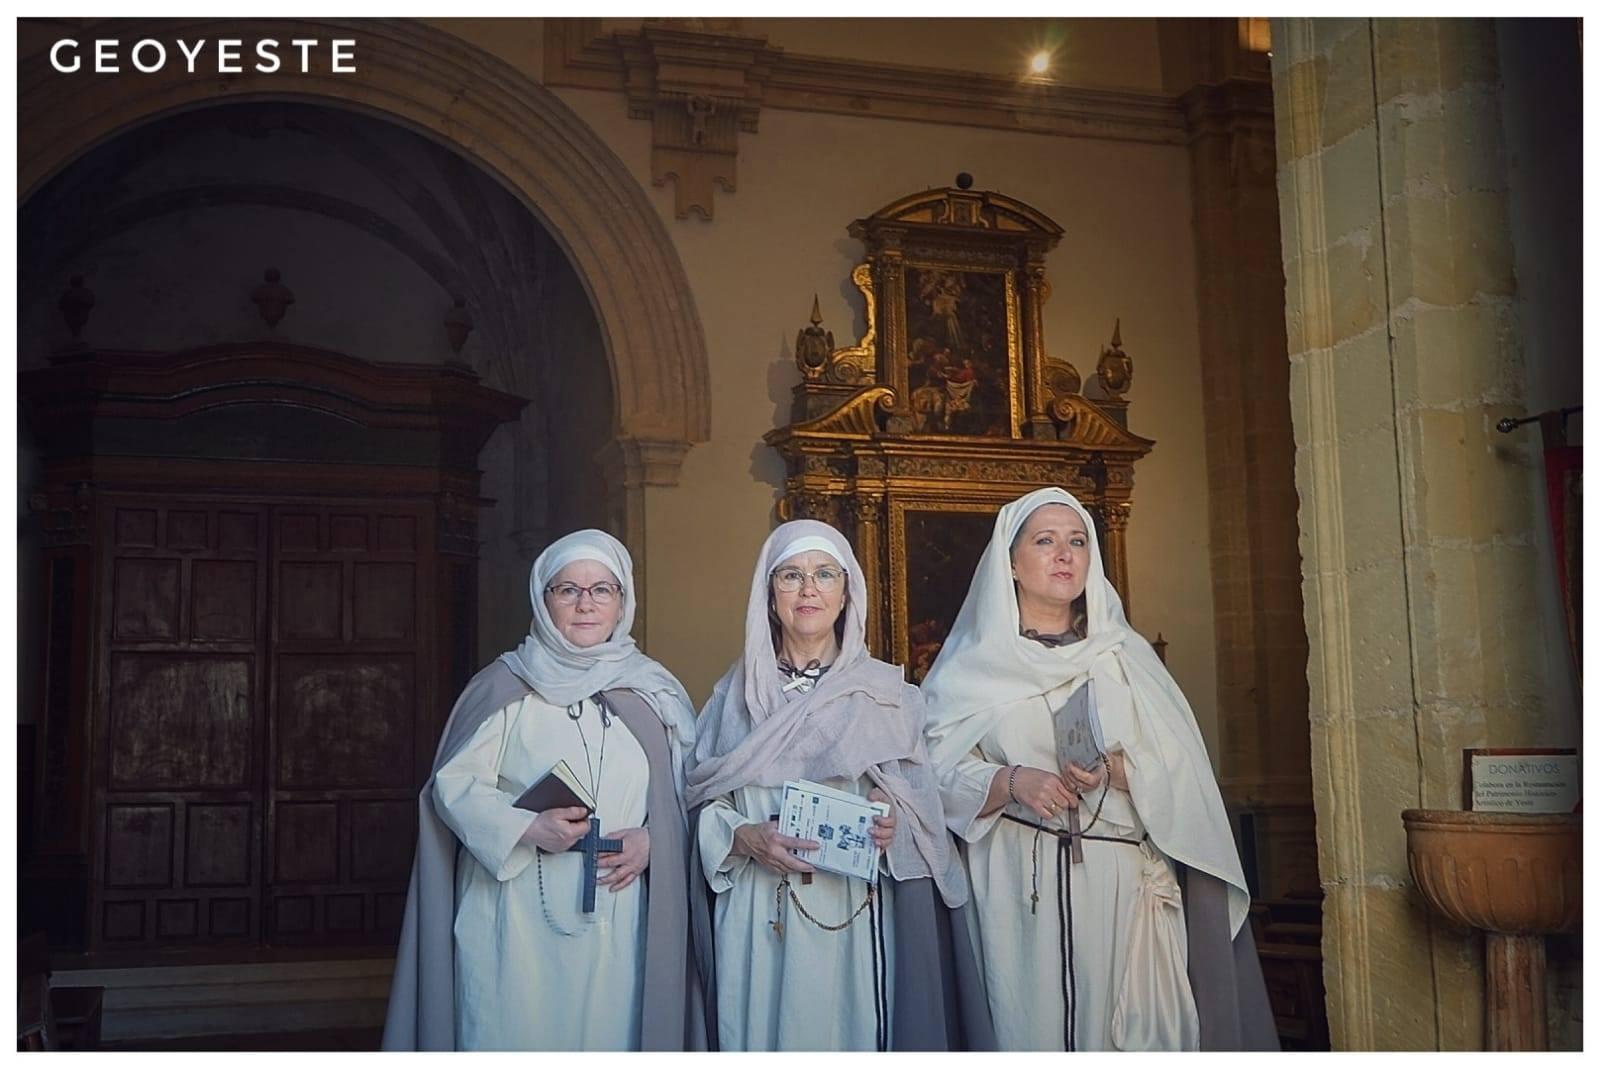 Jornadas históricas en Yeste jornadas  3